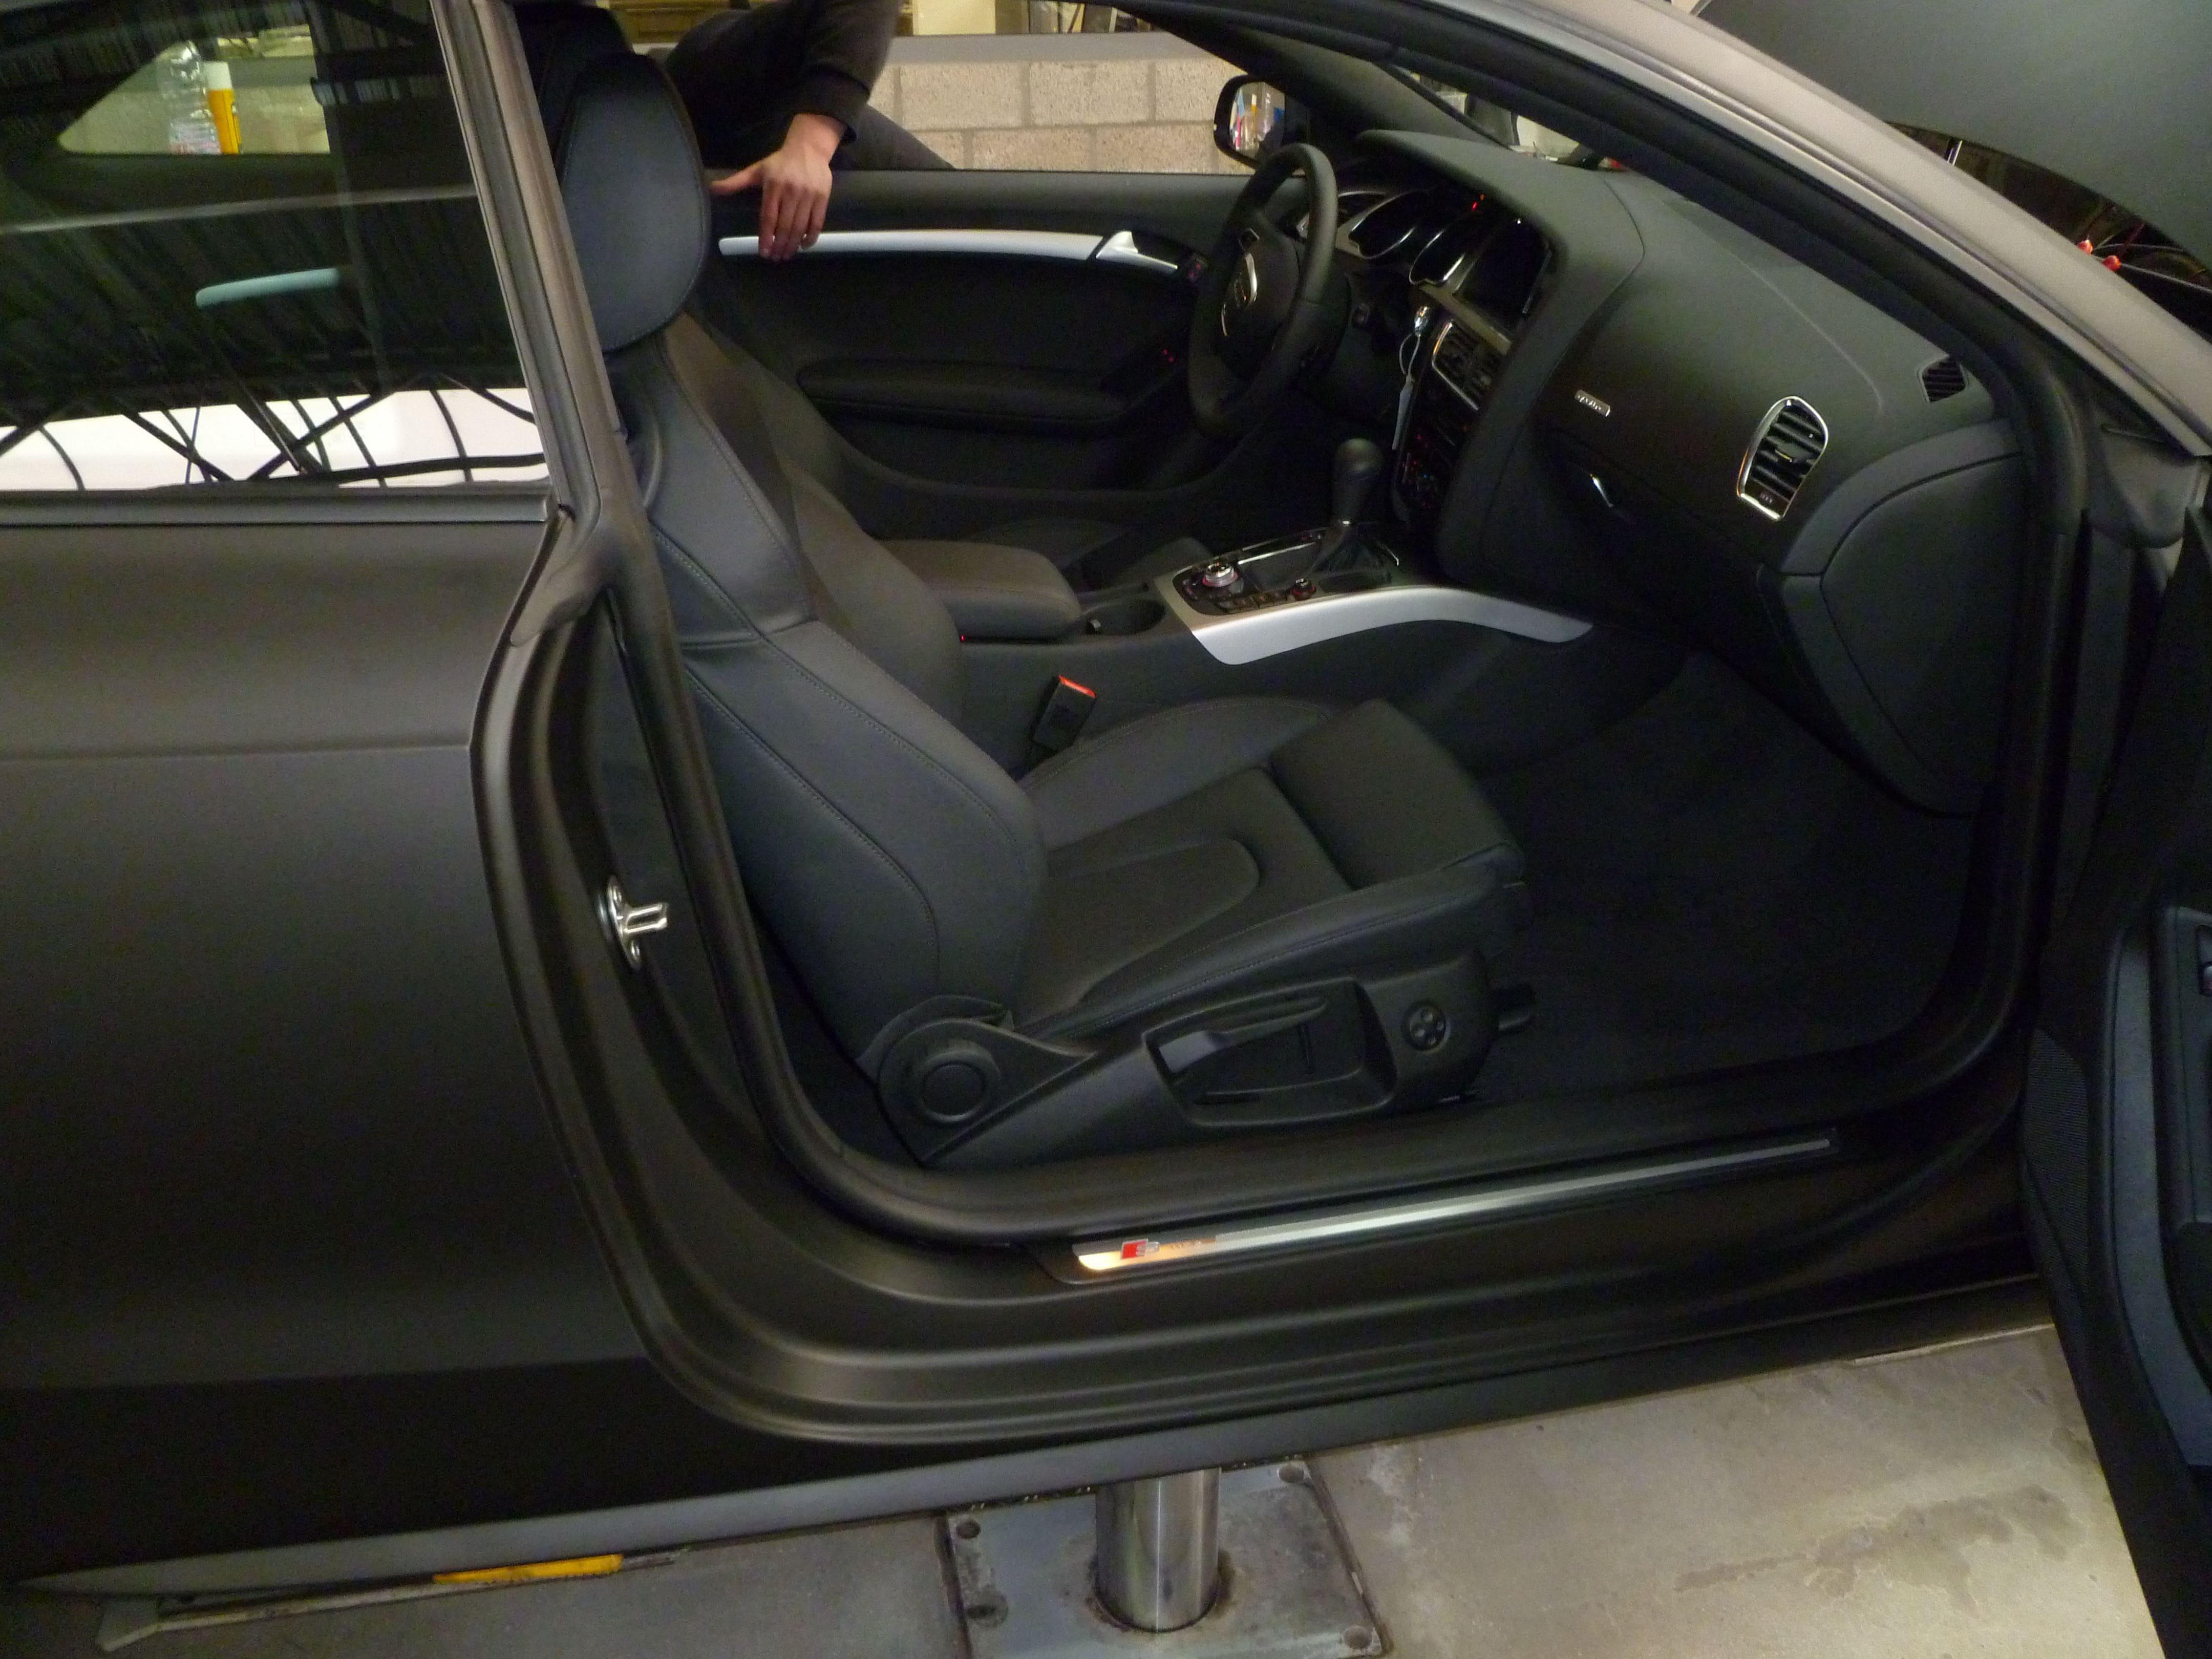 Audi A5 Coupe met Mat Zwarte Wrap, Carwrapping door Wrapmyride.nu Foto-nr:4651, ©2021